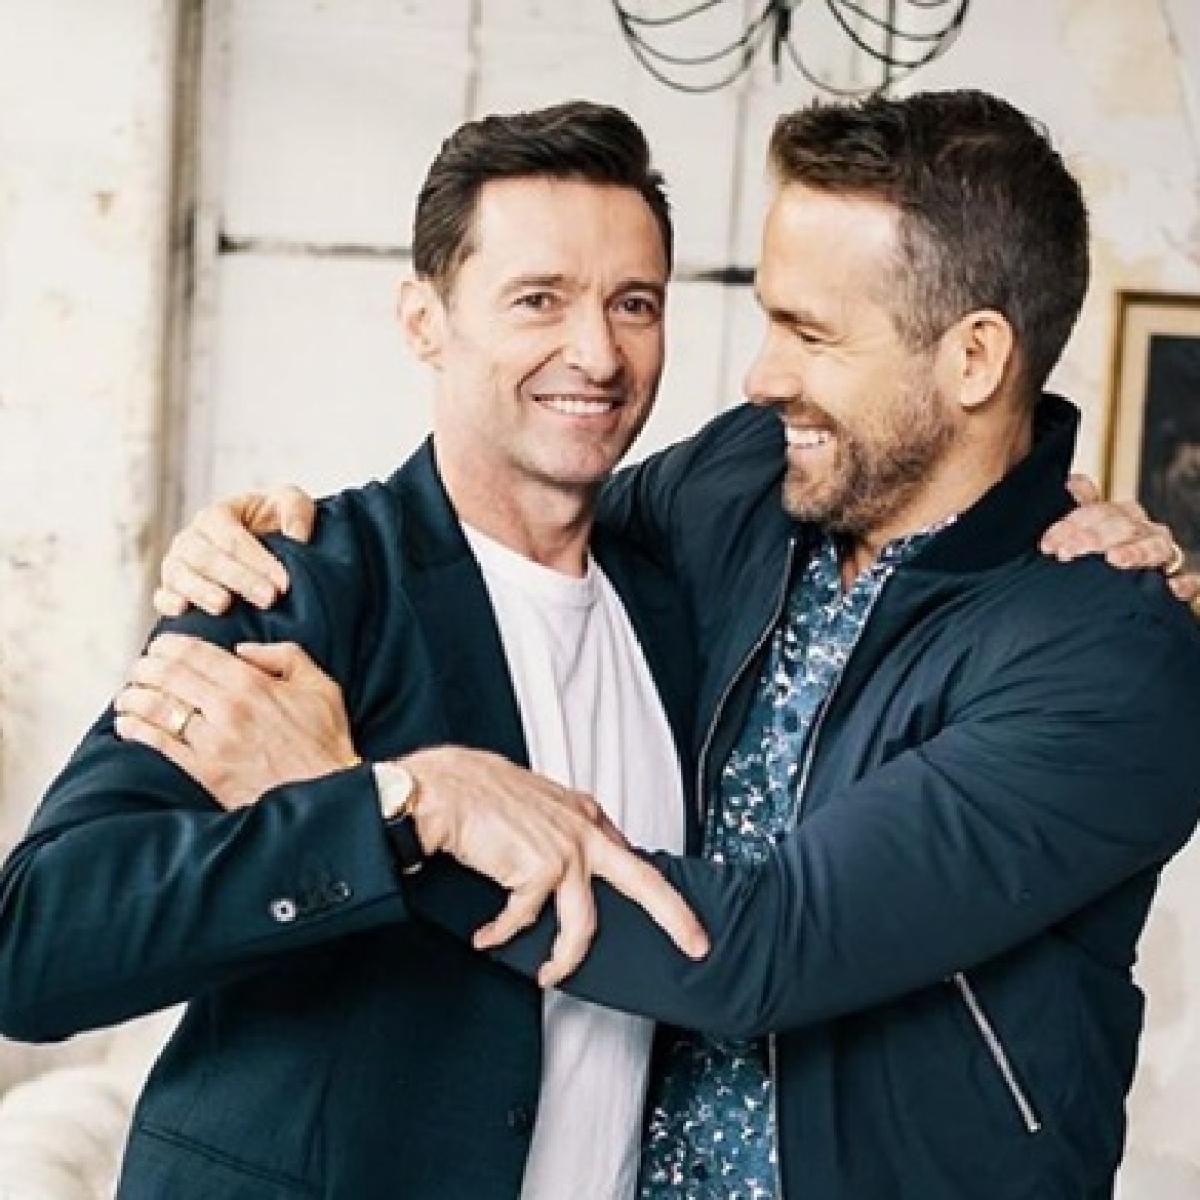 Hugh Jackman congratulates John Legend for 'Sexiest Man Alive' title by roasting BFF Ryan Reynolds